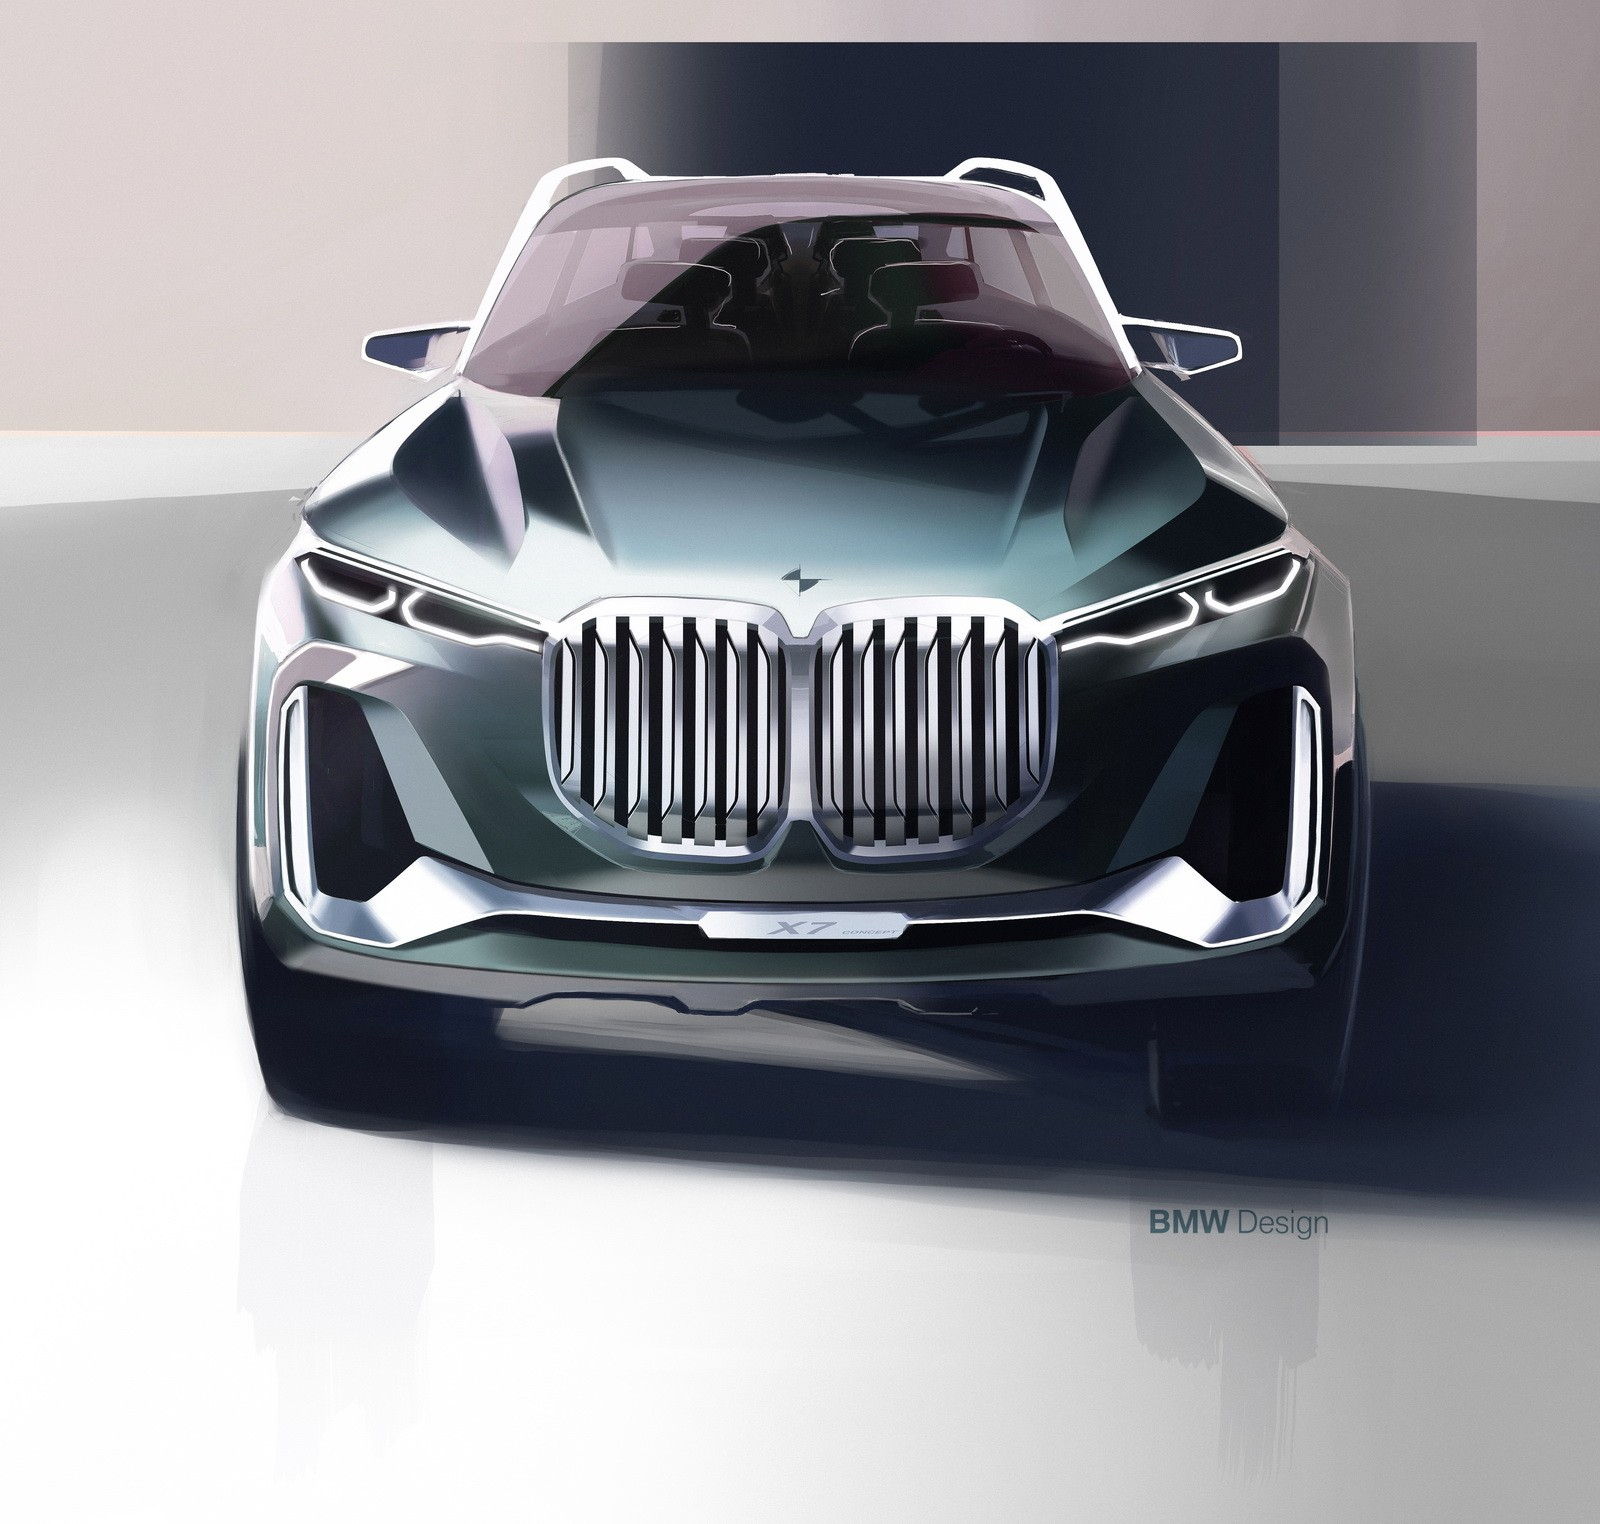 Bmw X7 2018: 2019 BMW X7 (G07) Looks Massive In Design Patent